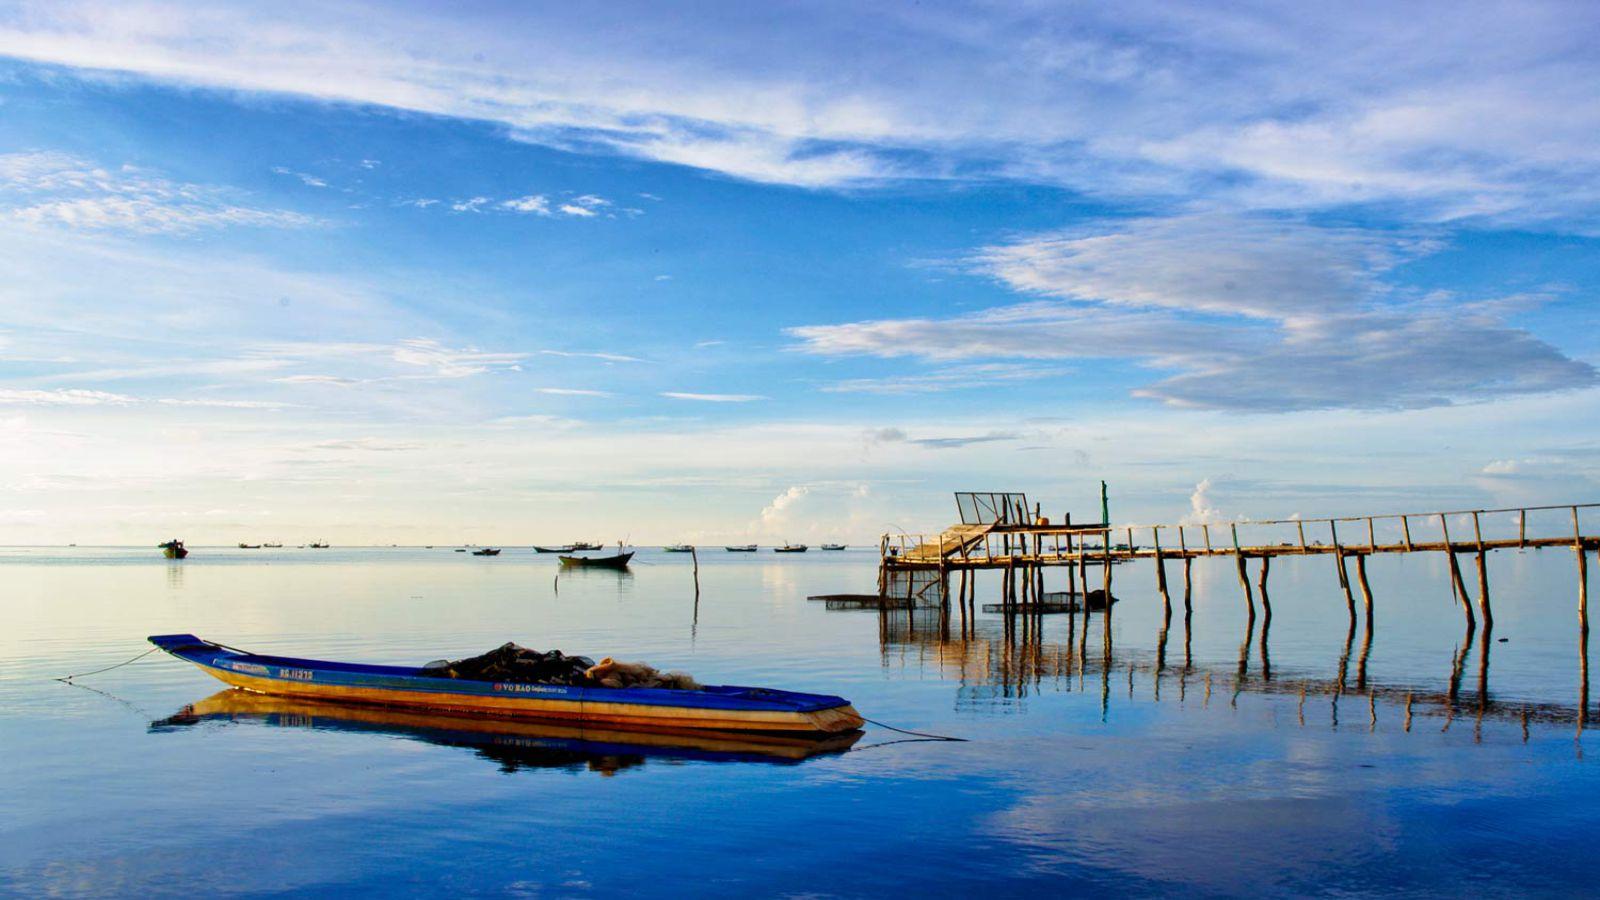 Visiting Phu Quoc, Vietnam's largest island